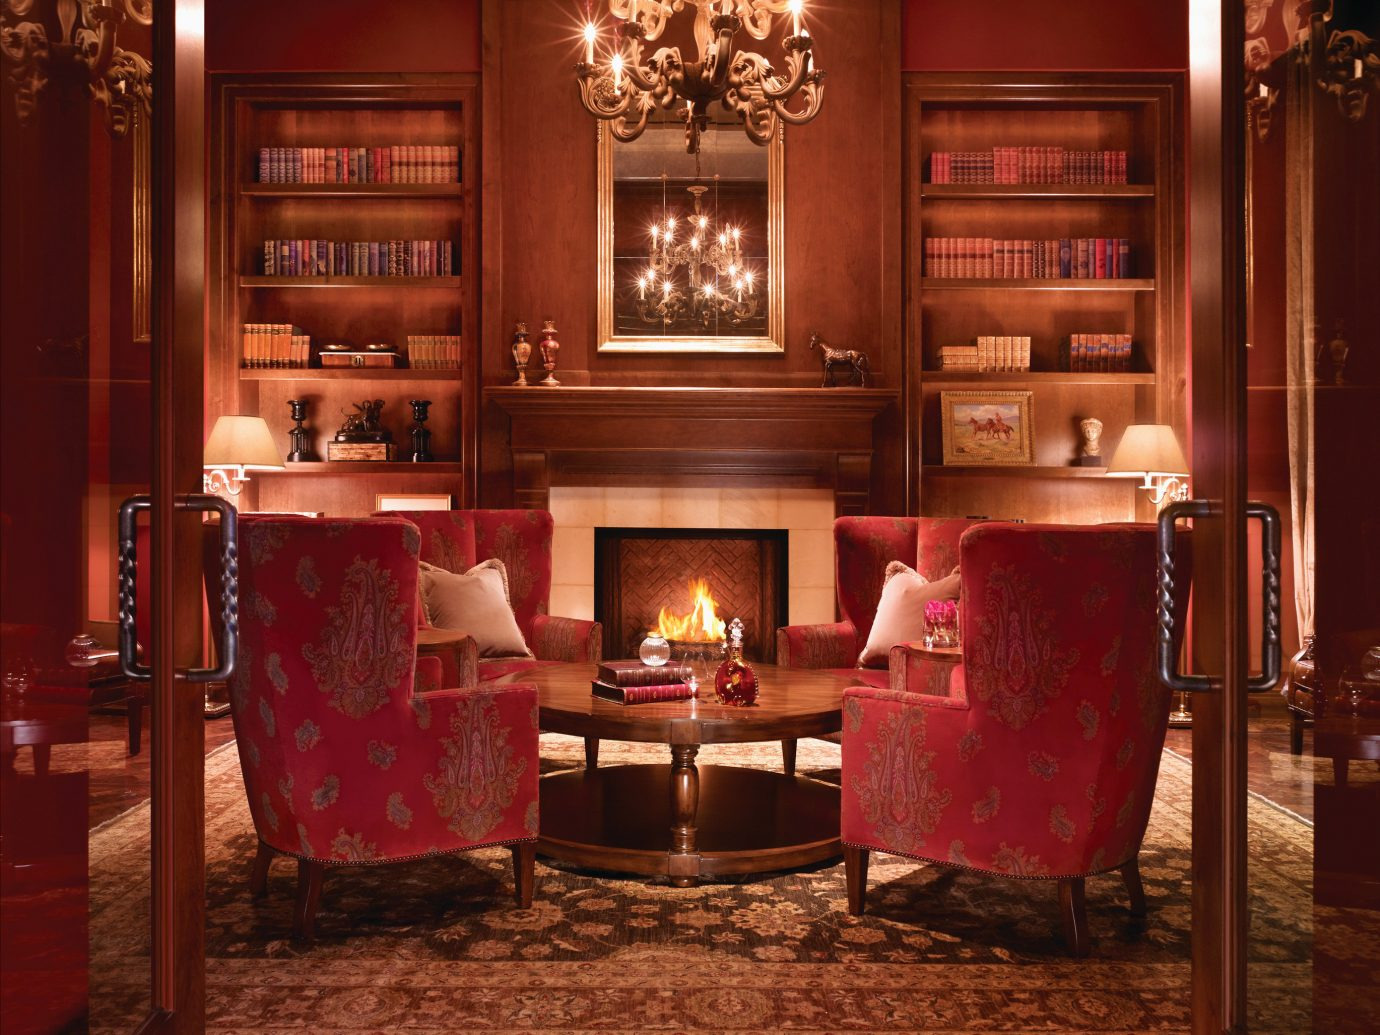 Trip Ideas indoor room Living interior design estate home living room cabinetry dining room furniture